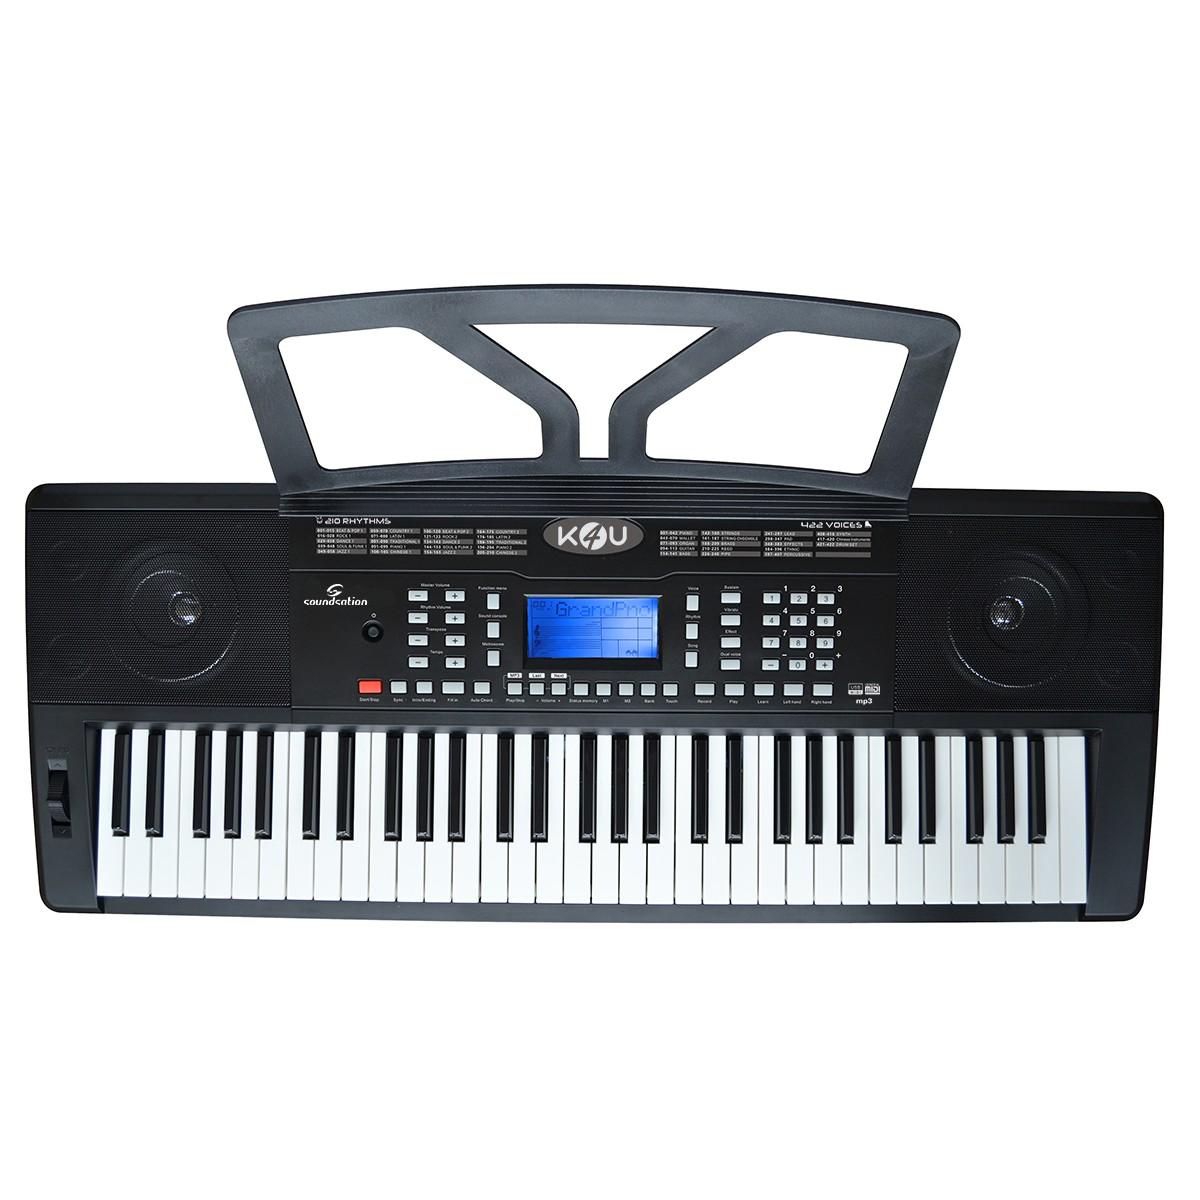 TASTIERA ARRANGER SOUNDSATION K4U -  61 TASTI CON TOUCH RESPONSE ED MP3